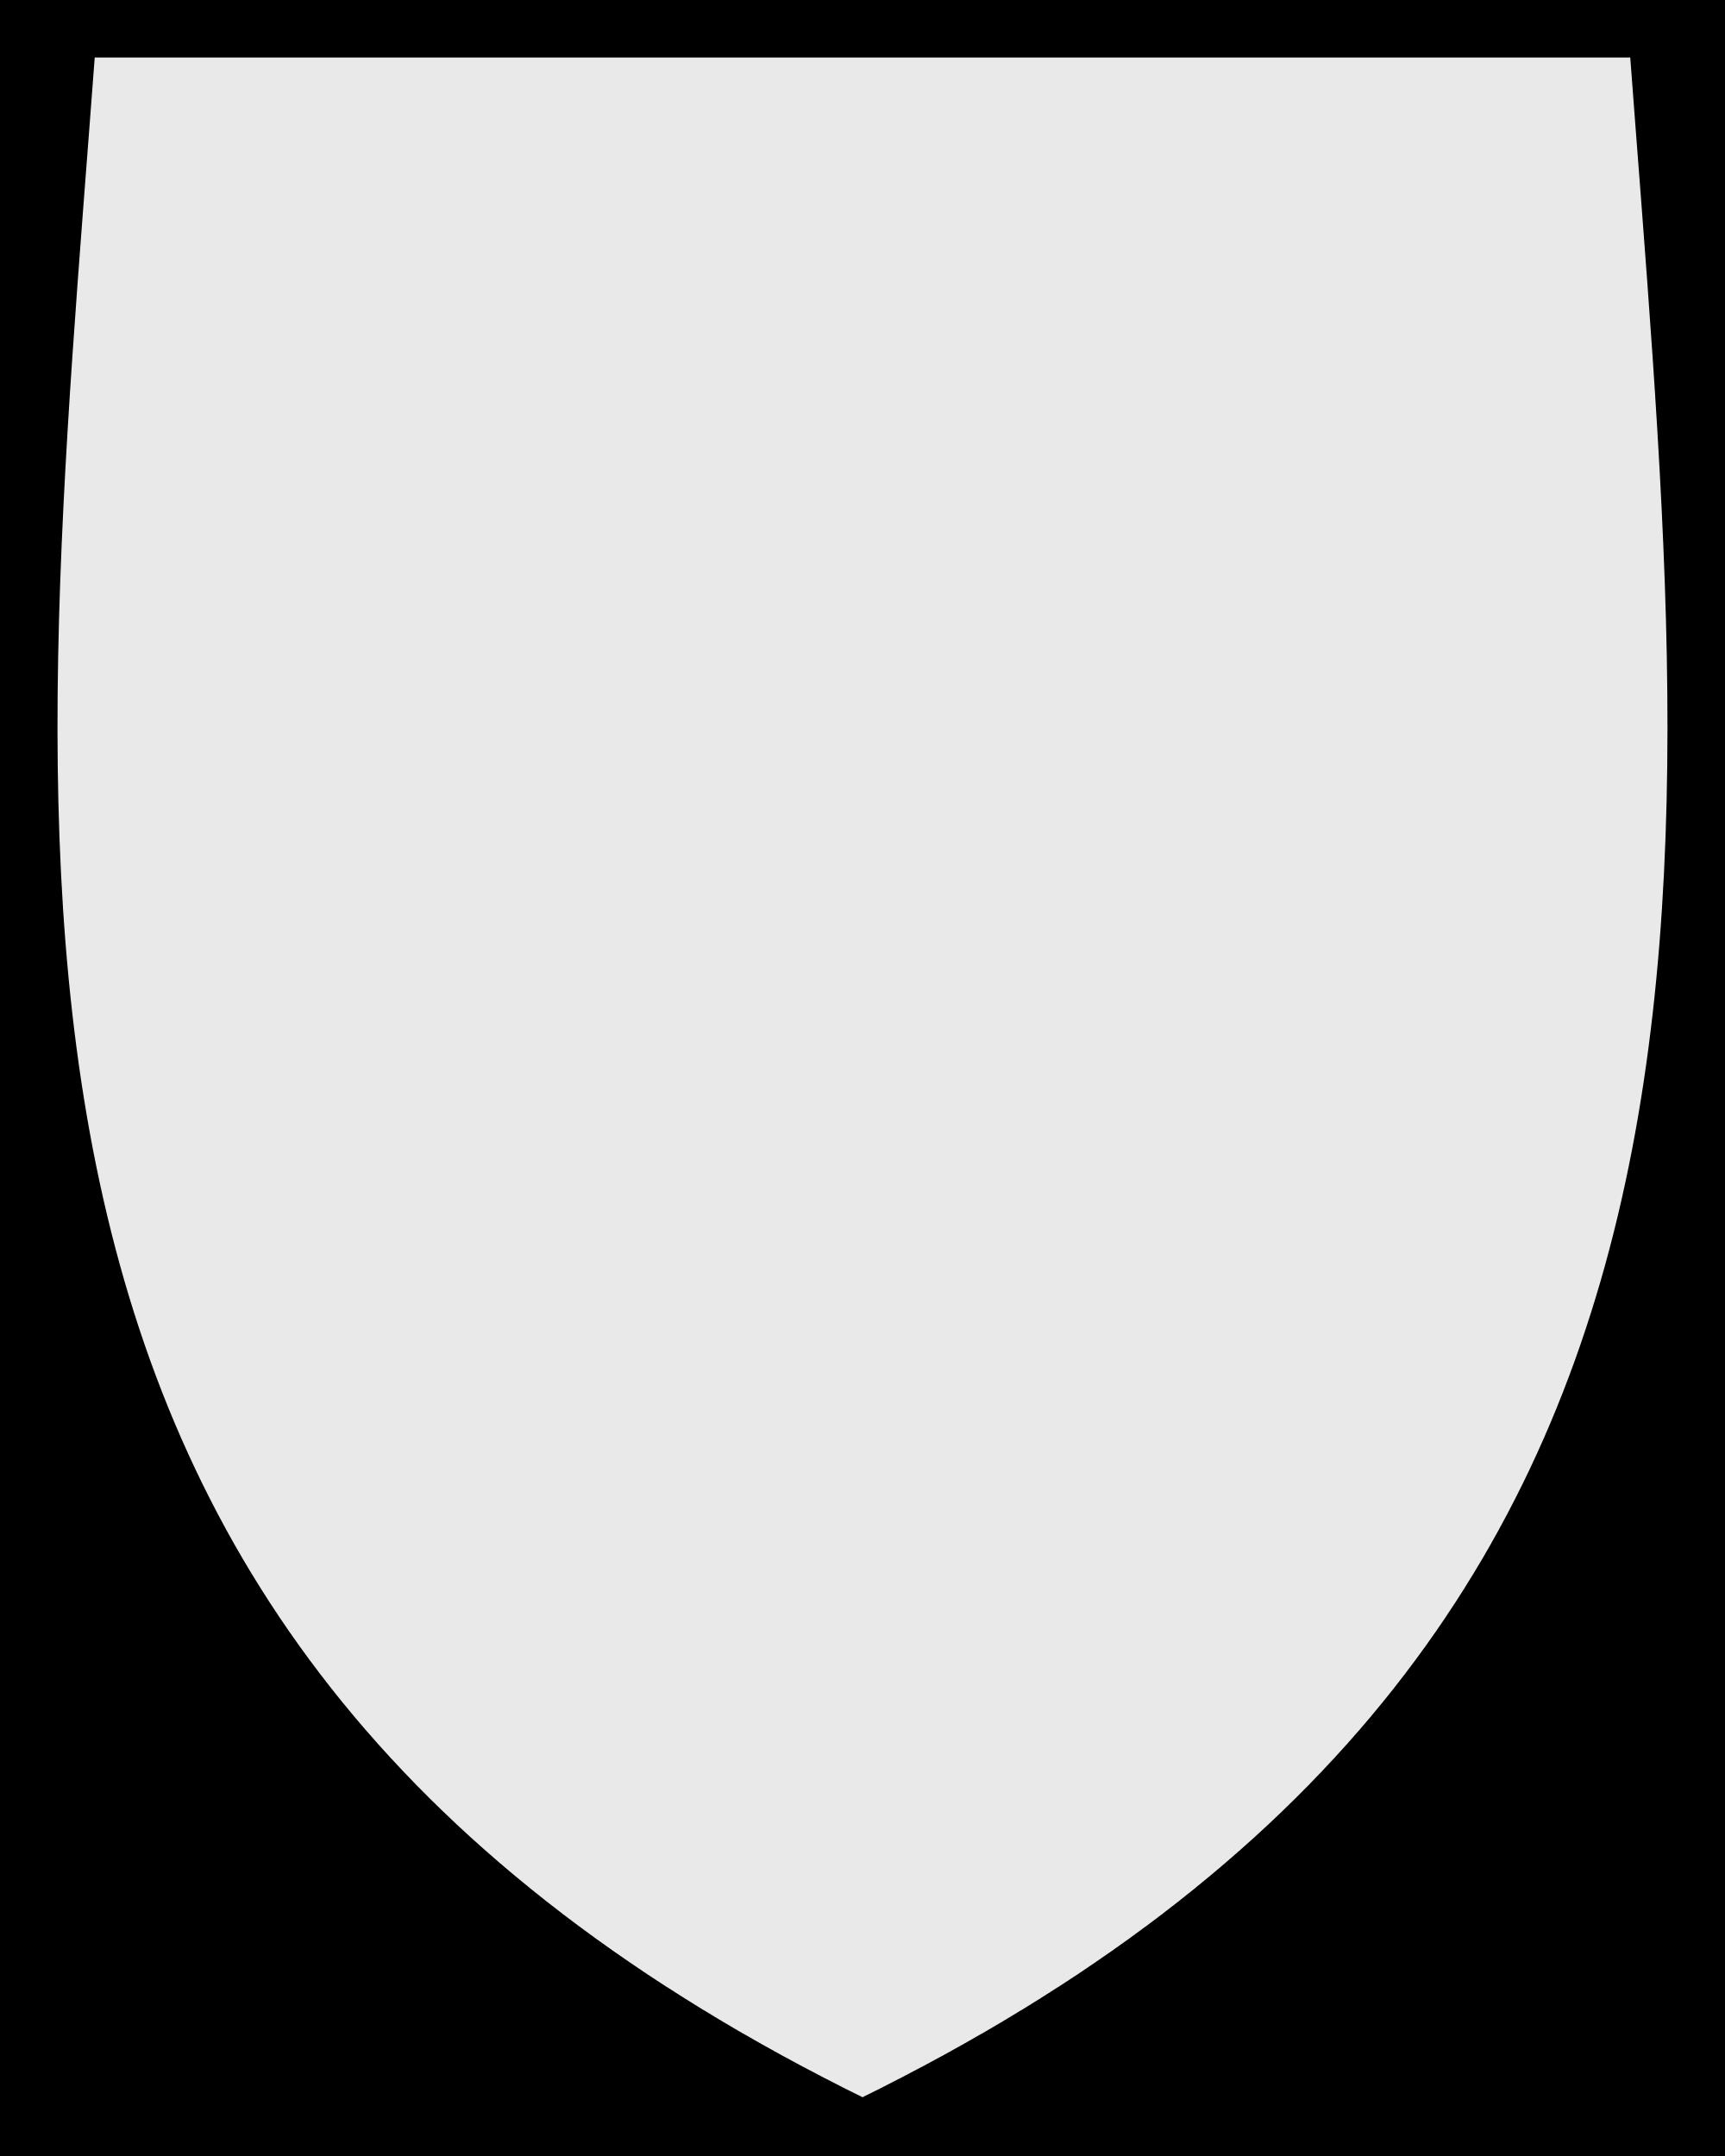 2000x2500 Shield